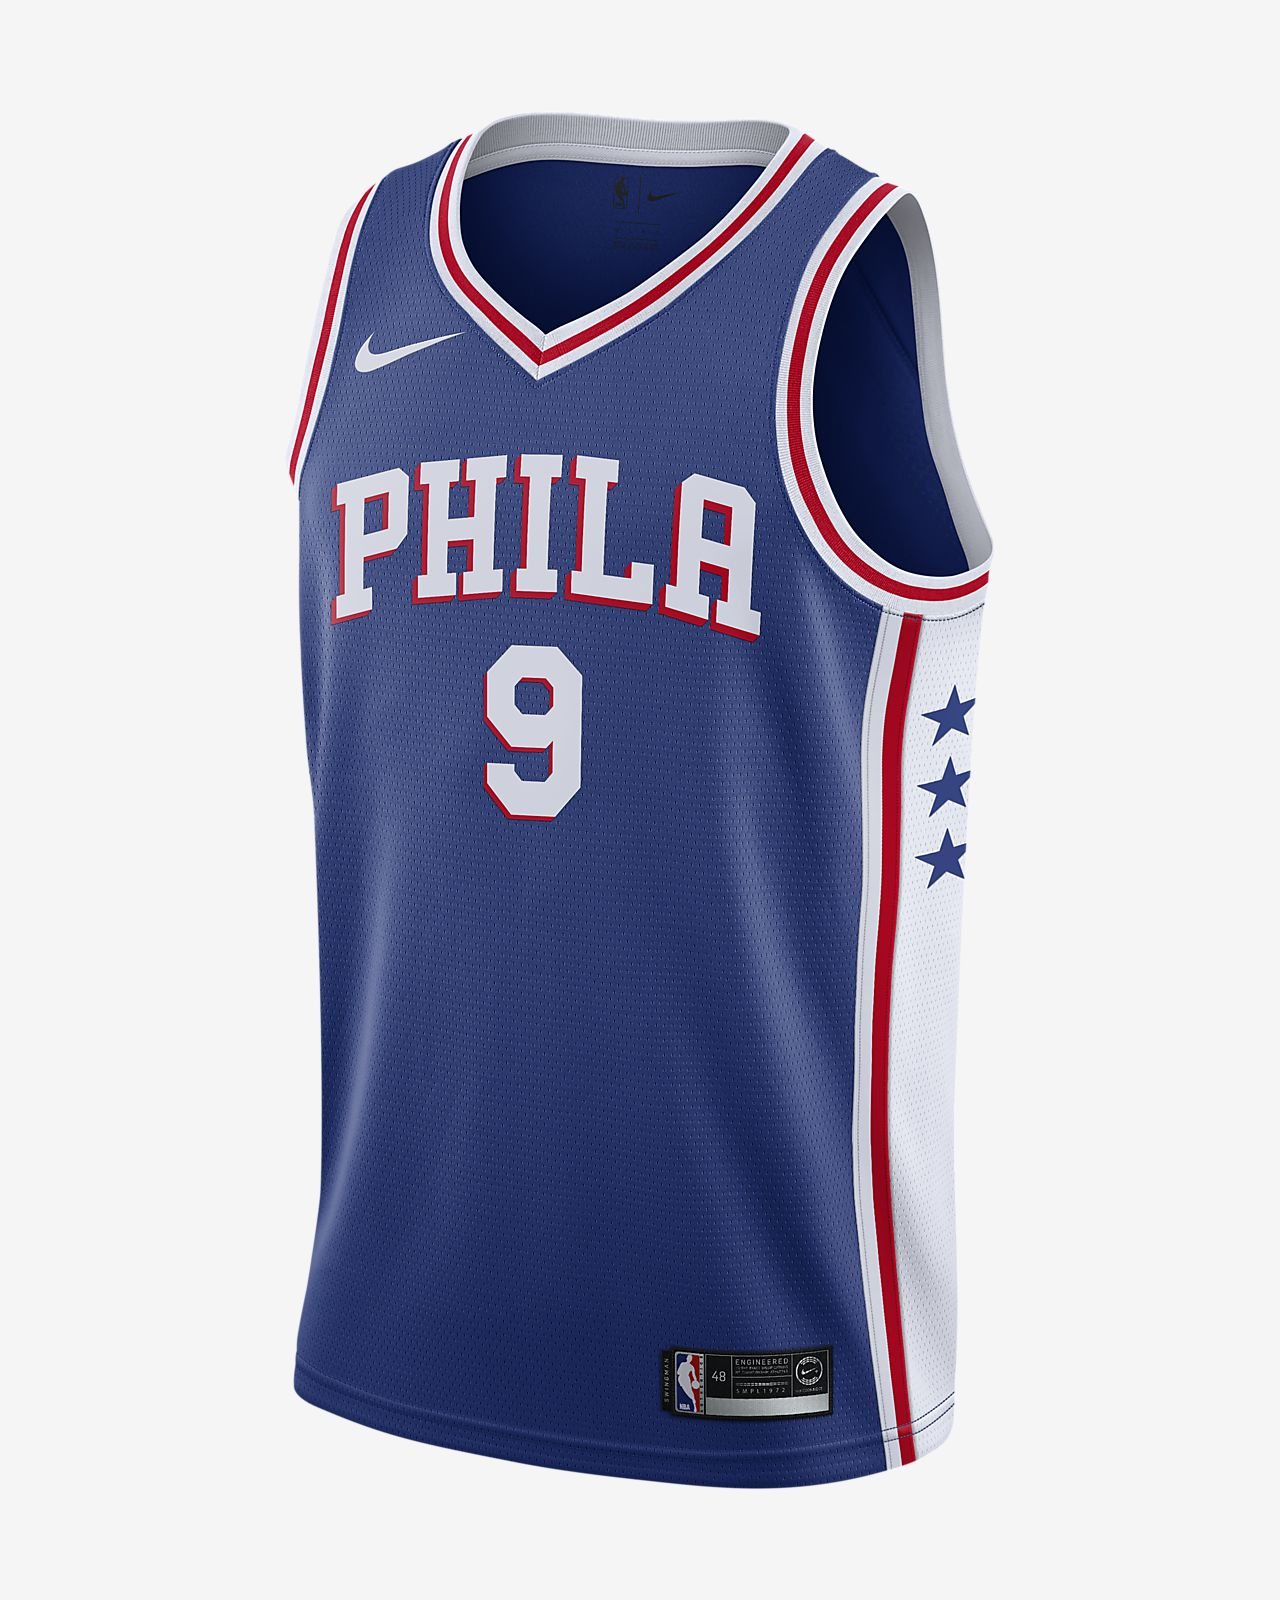 Мужское джерси Nike НБА Dario Šaric Icon Edition Swingman (Philadelphia 76ers) с технологией NikeConnect